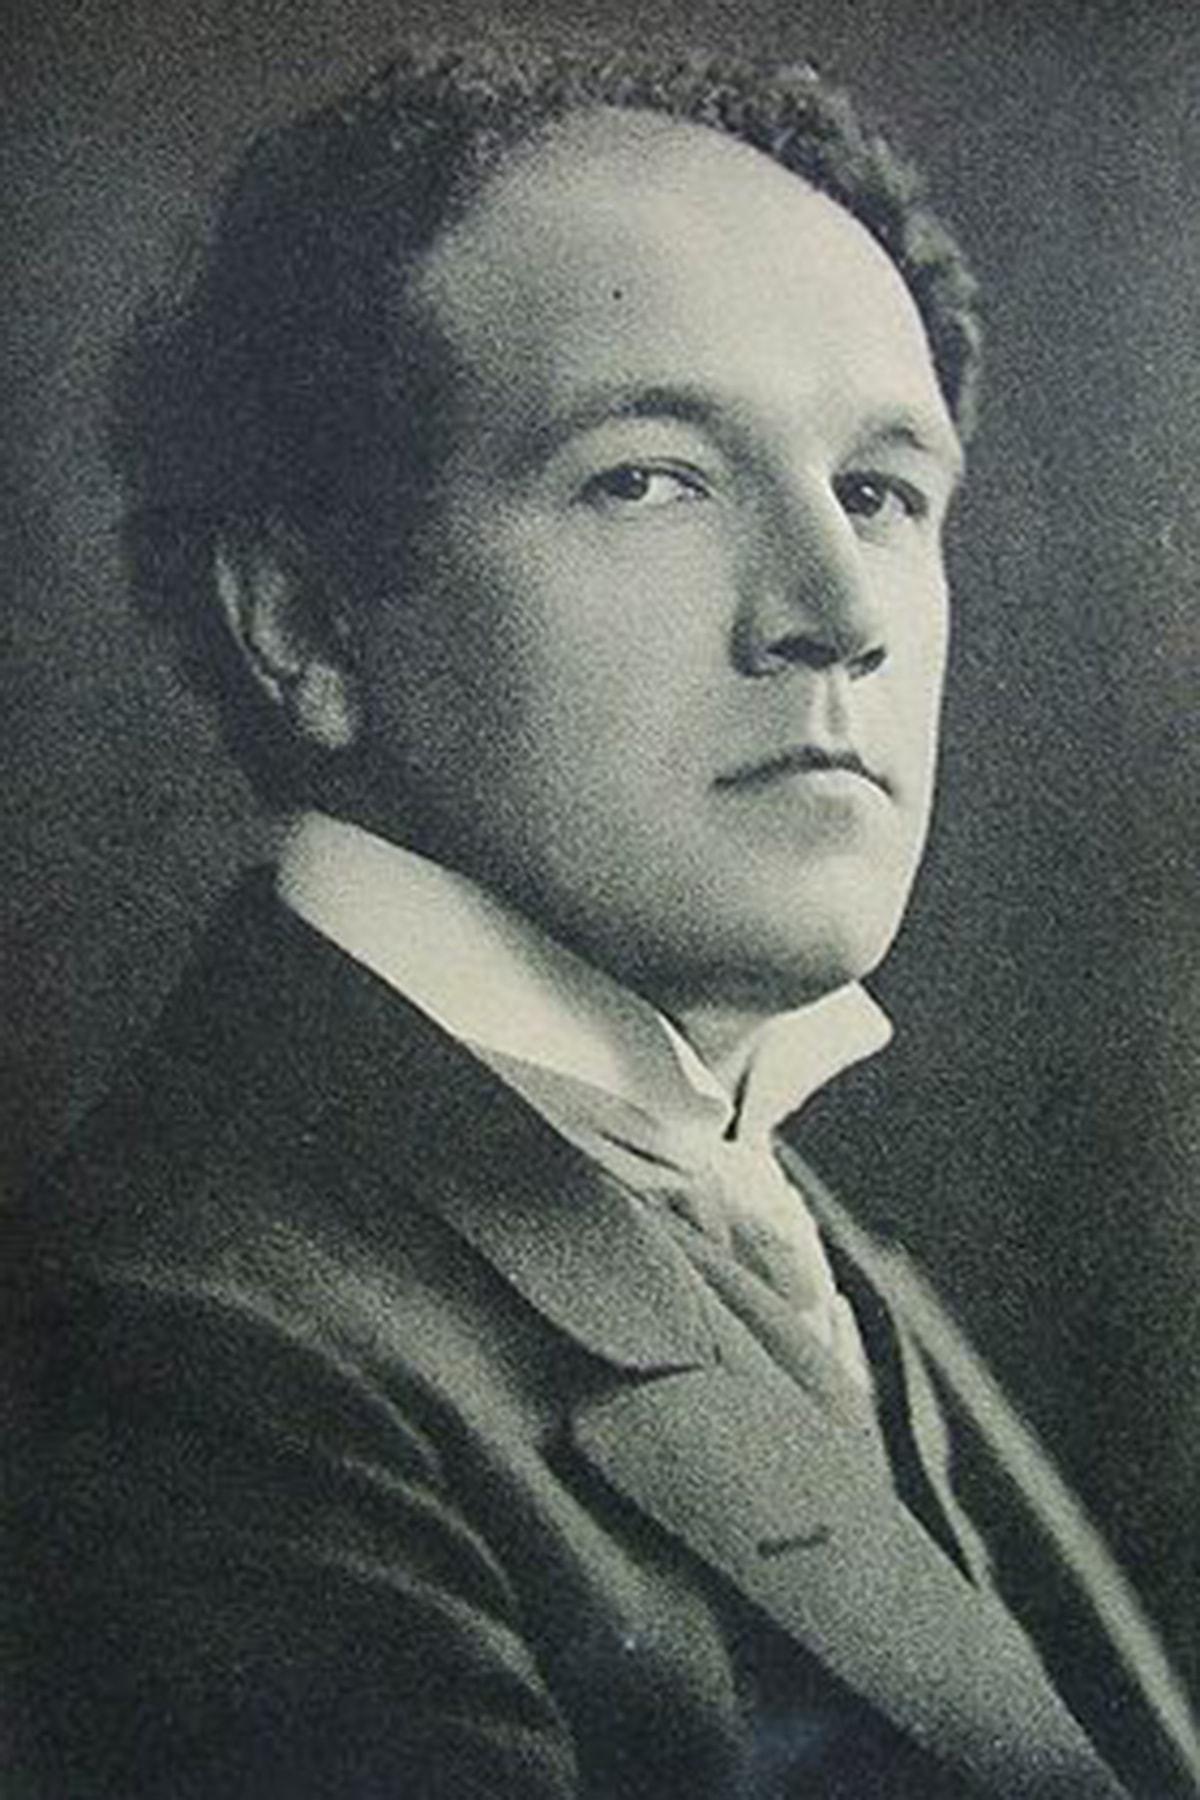 Николай Метнер, 1910 год